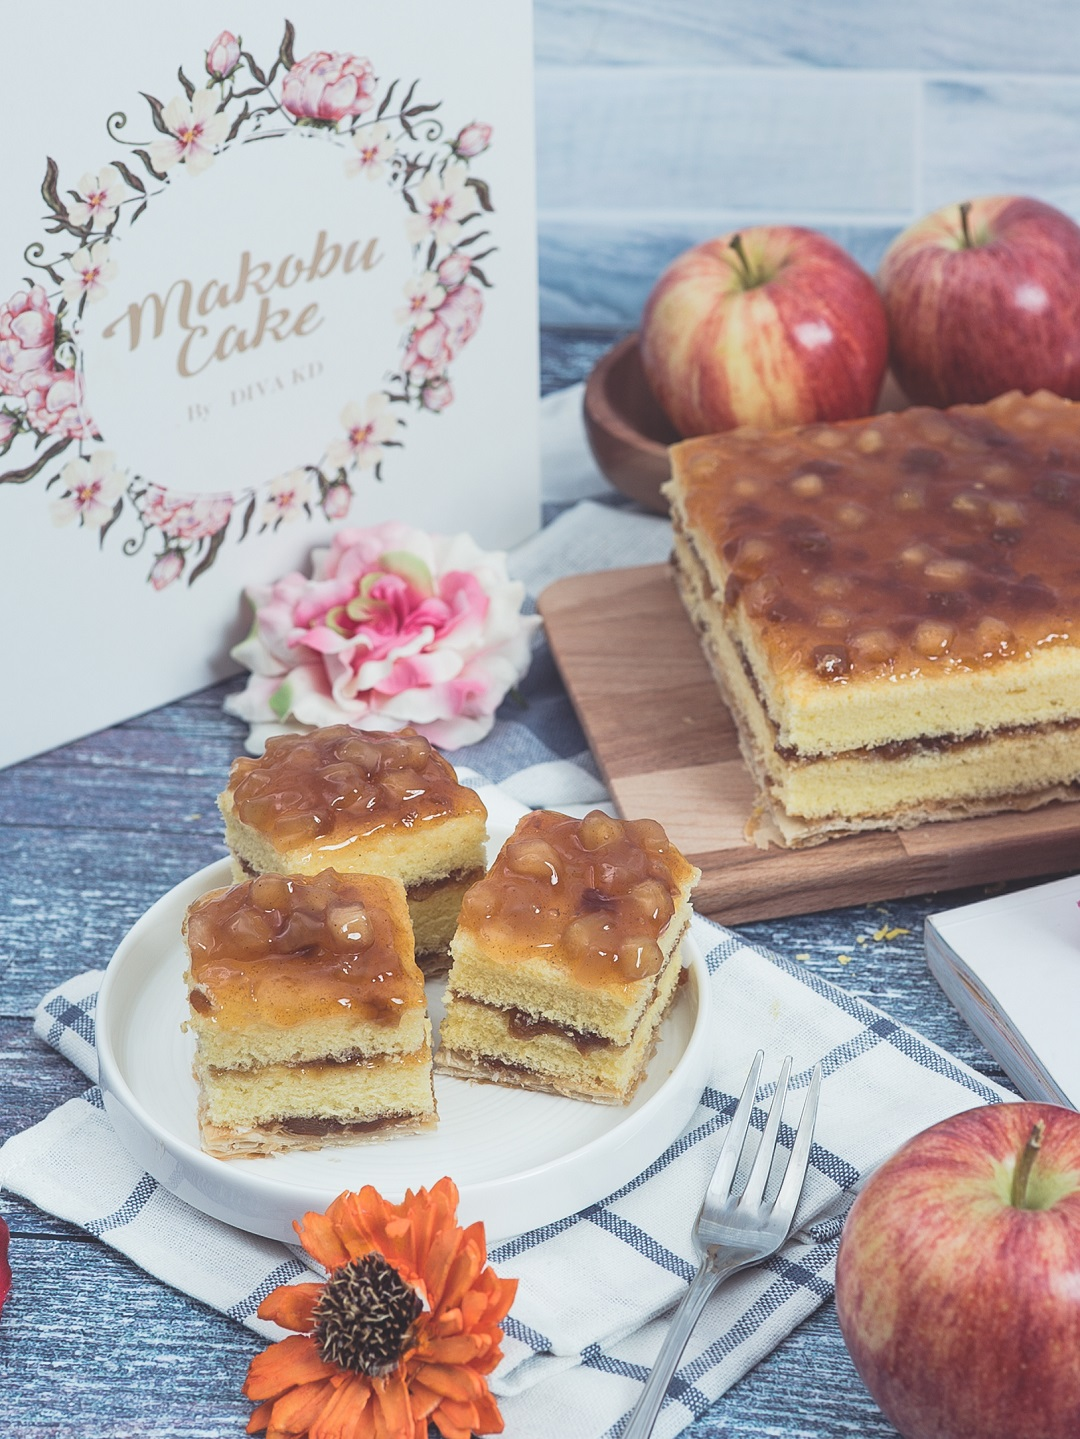 Castelle Apple, Malang, Kota Malang, Dolan Dolen, Dolaners Apple 1 - Dolan Dolen